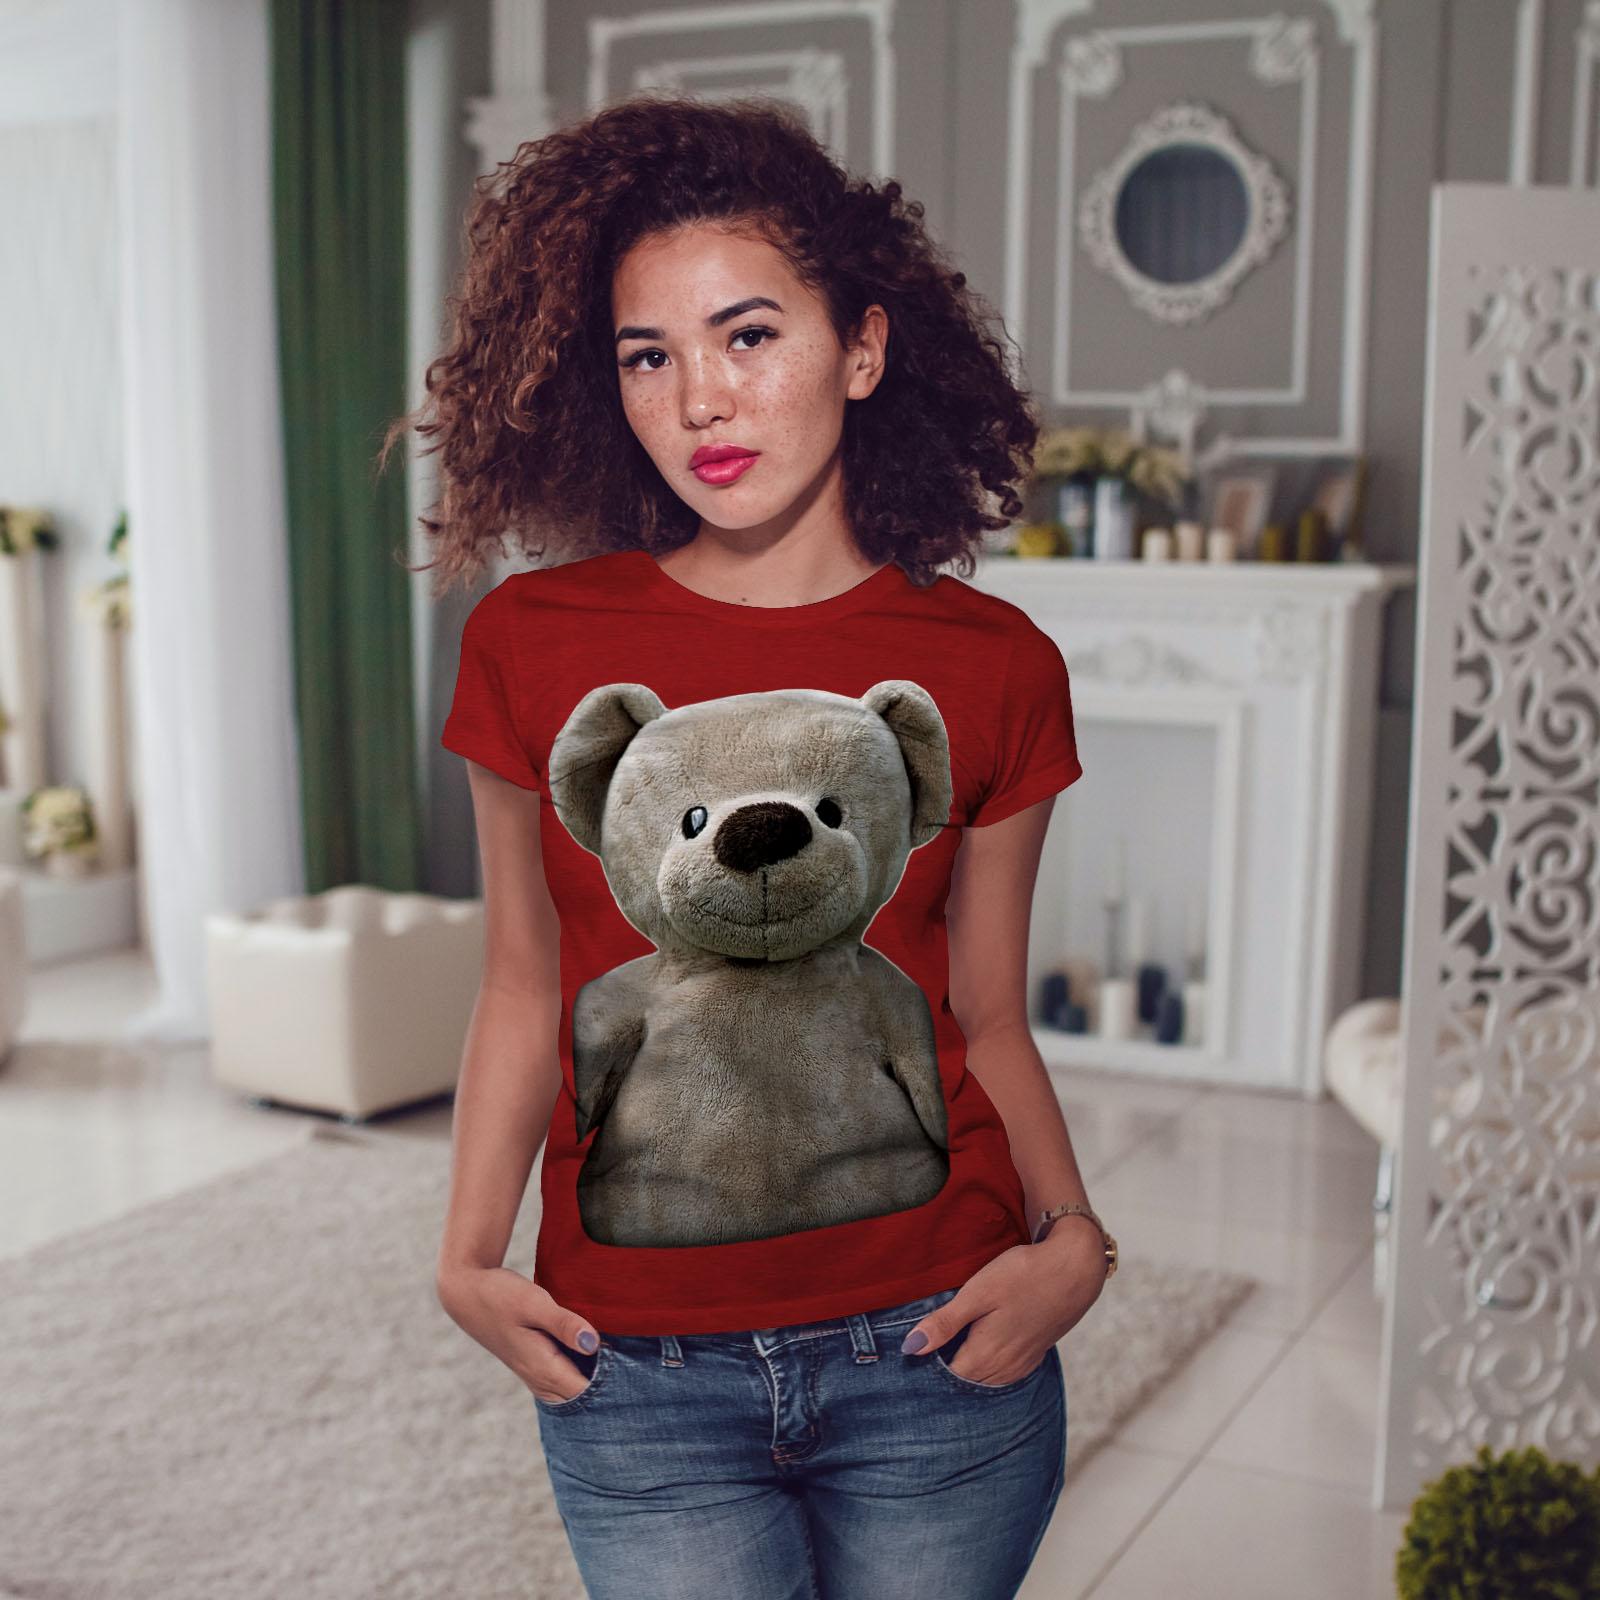 miniature 11 - Wellcoda Cute Plush Womens T-shirt, Teddy Bear Casual Design Printed Tee